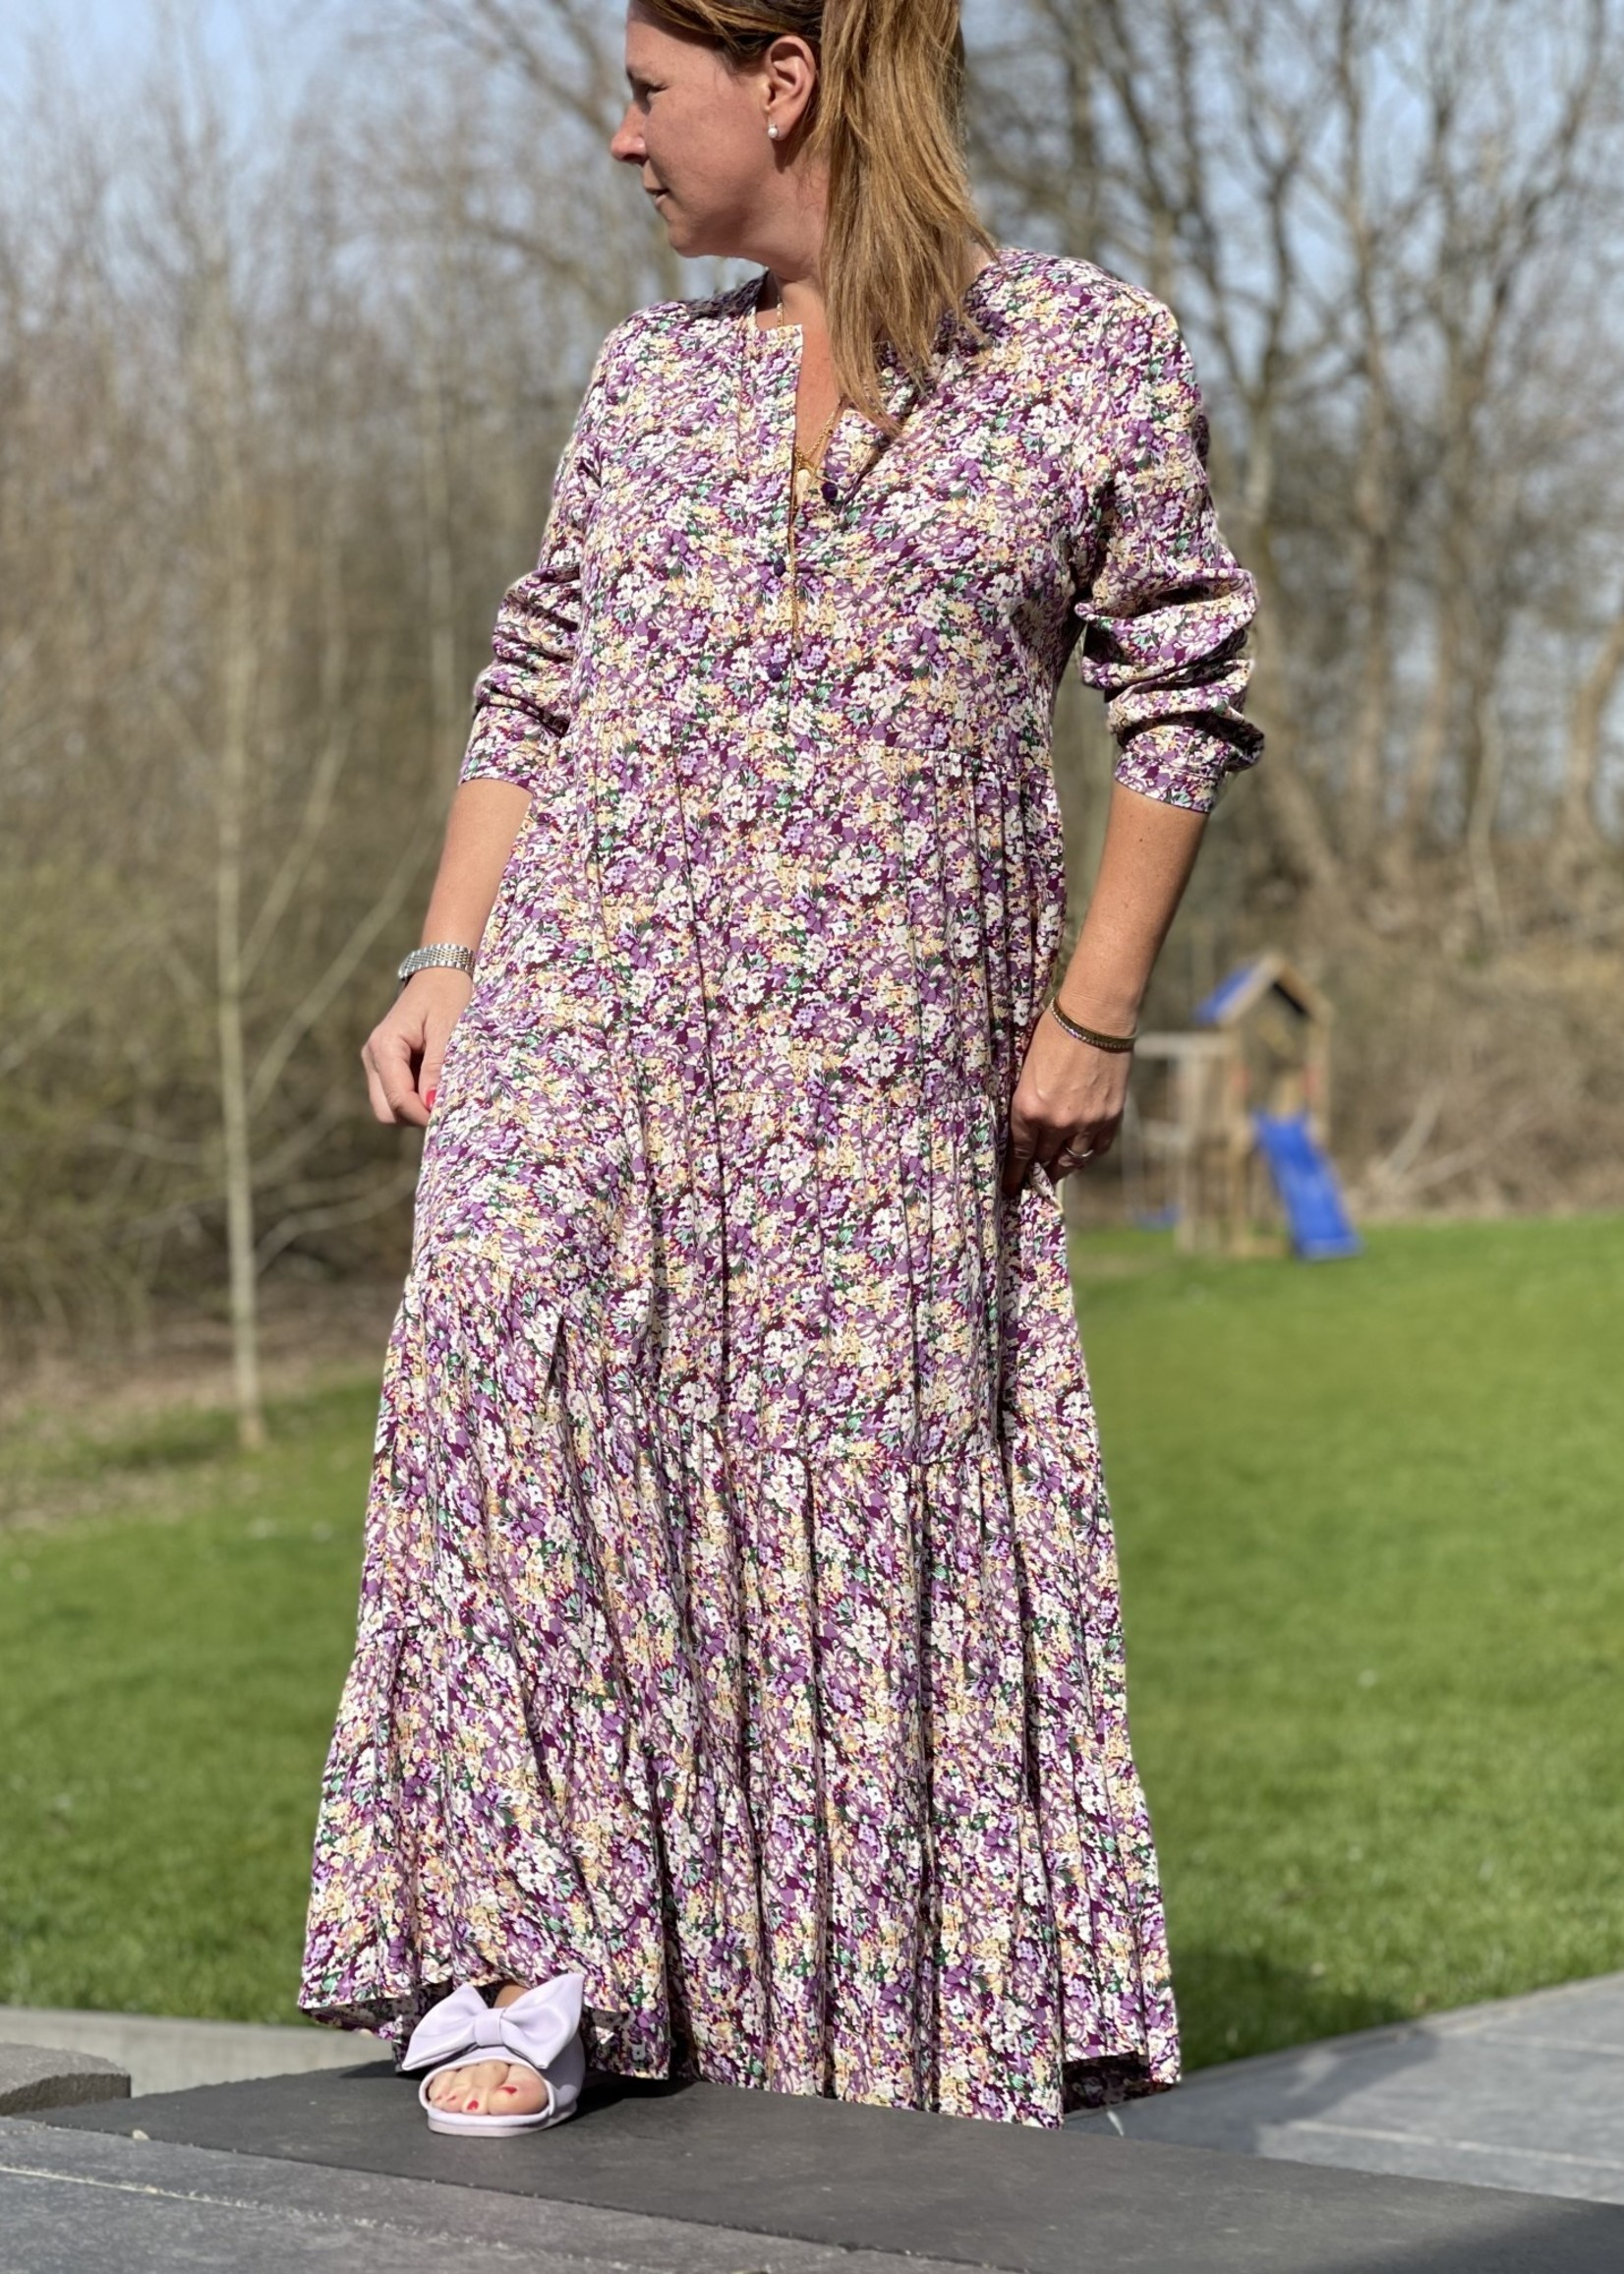 Guts & Goats Ilona Maxi Dress